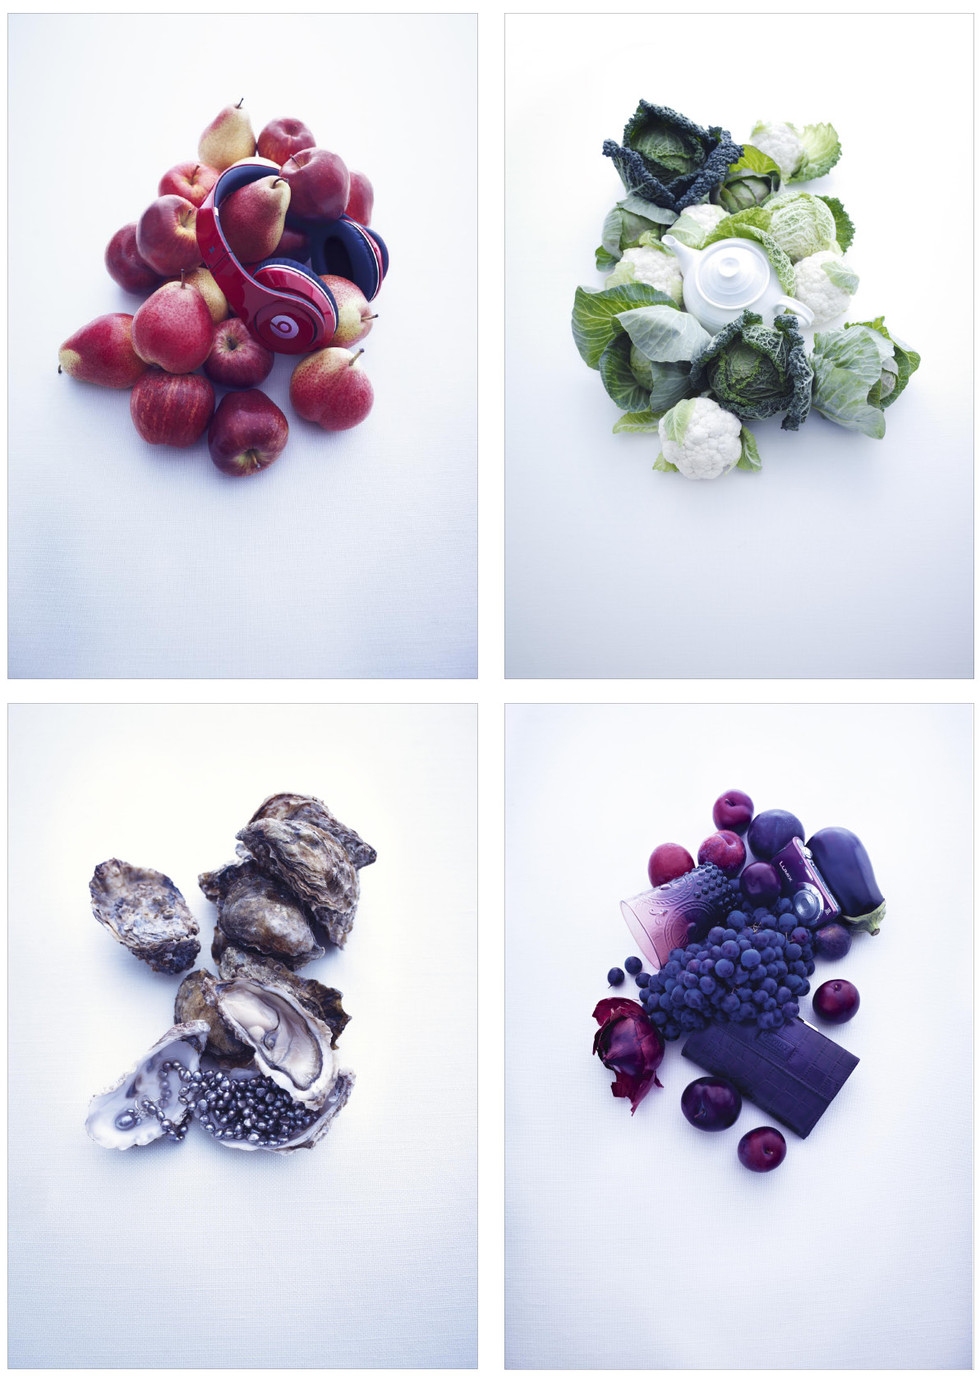 WAITROSE FOOD, FASHION & HOME | Local Marketing posters